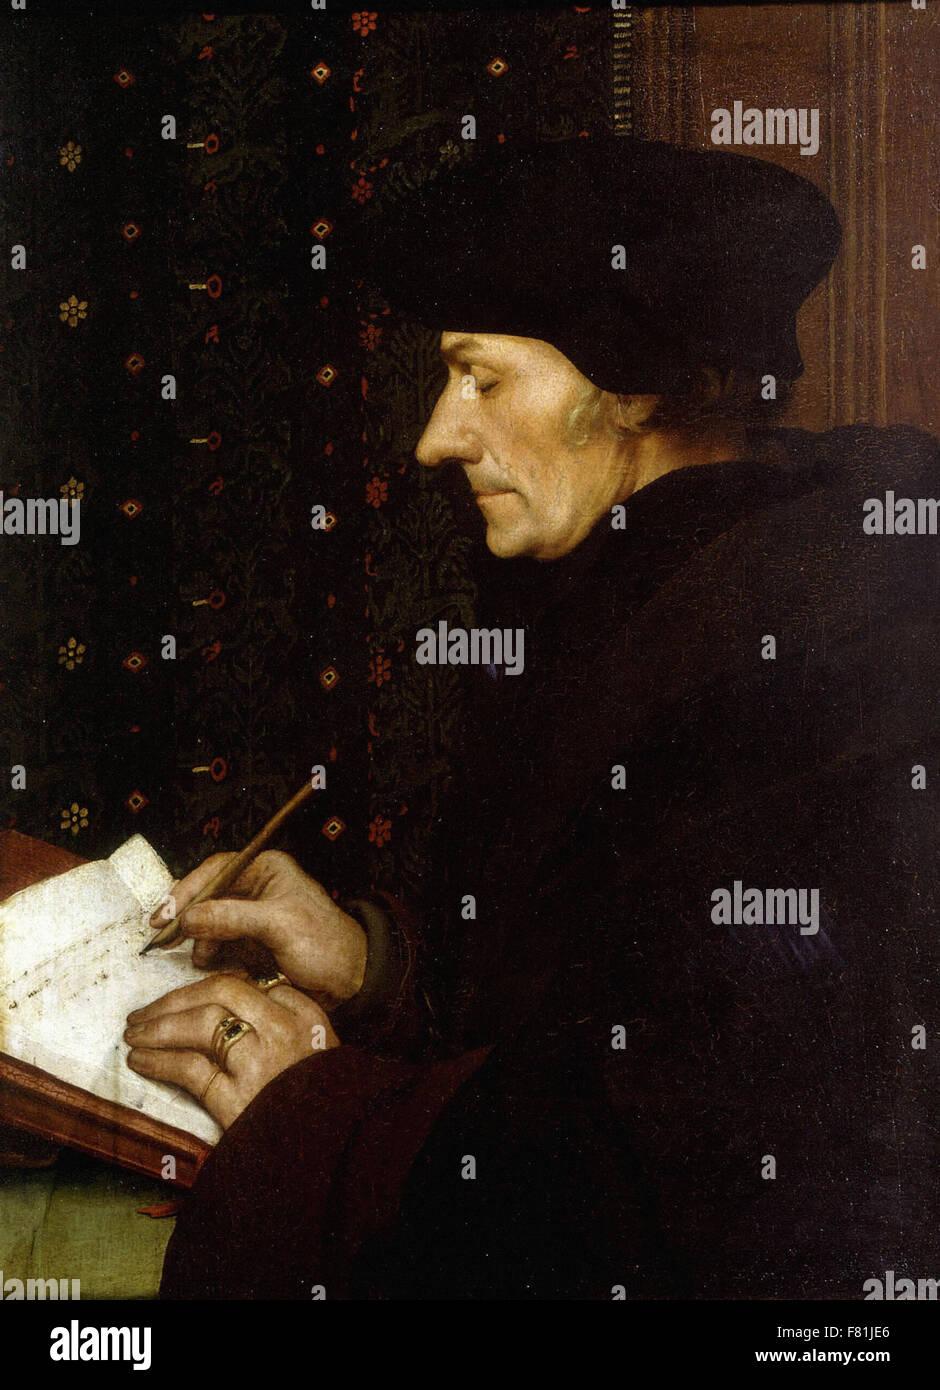 Hans Holbein the Younger - Portrait of Erasmus - Louvre Museum Paris - Stock Image